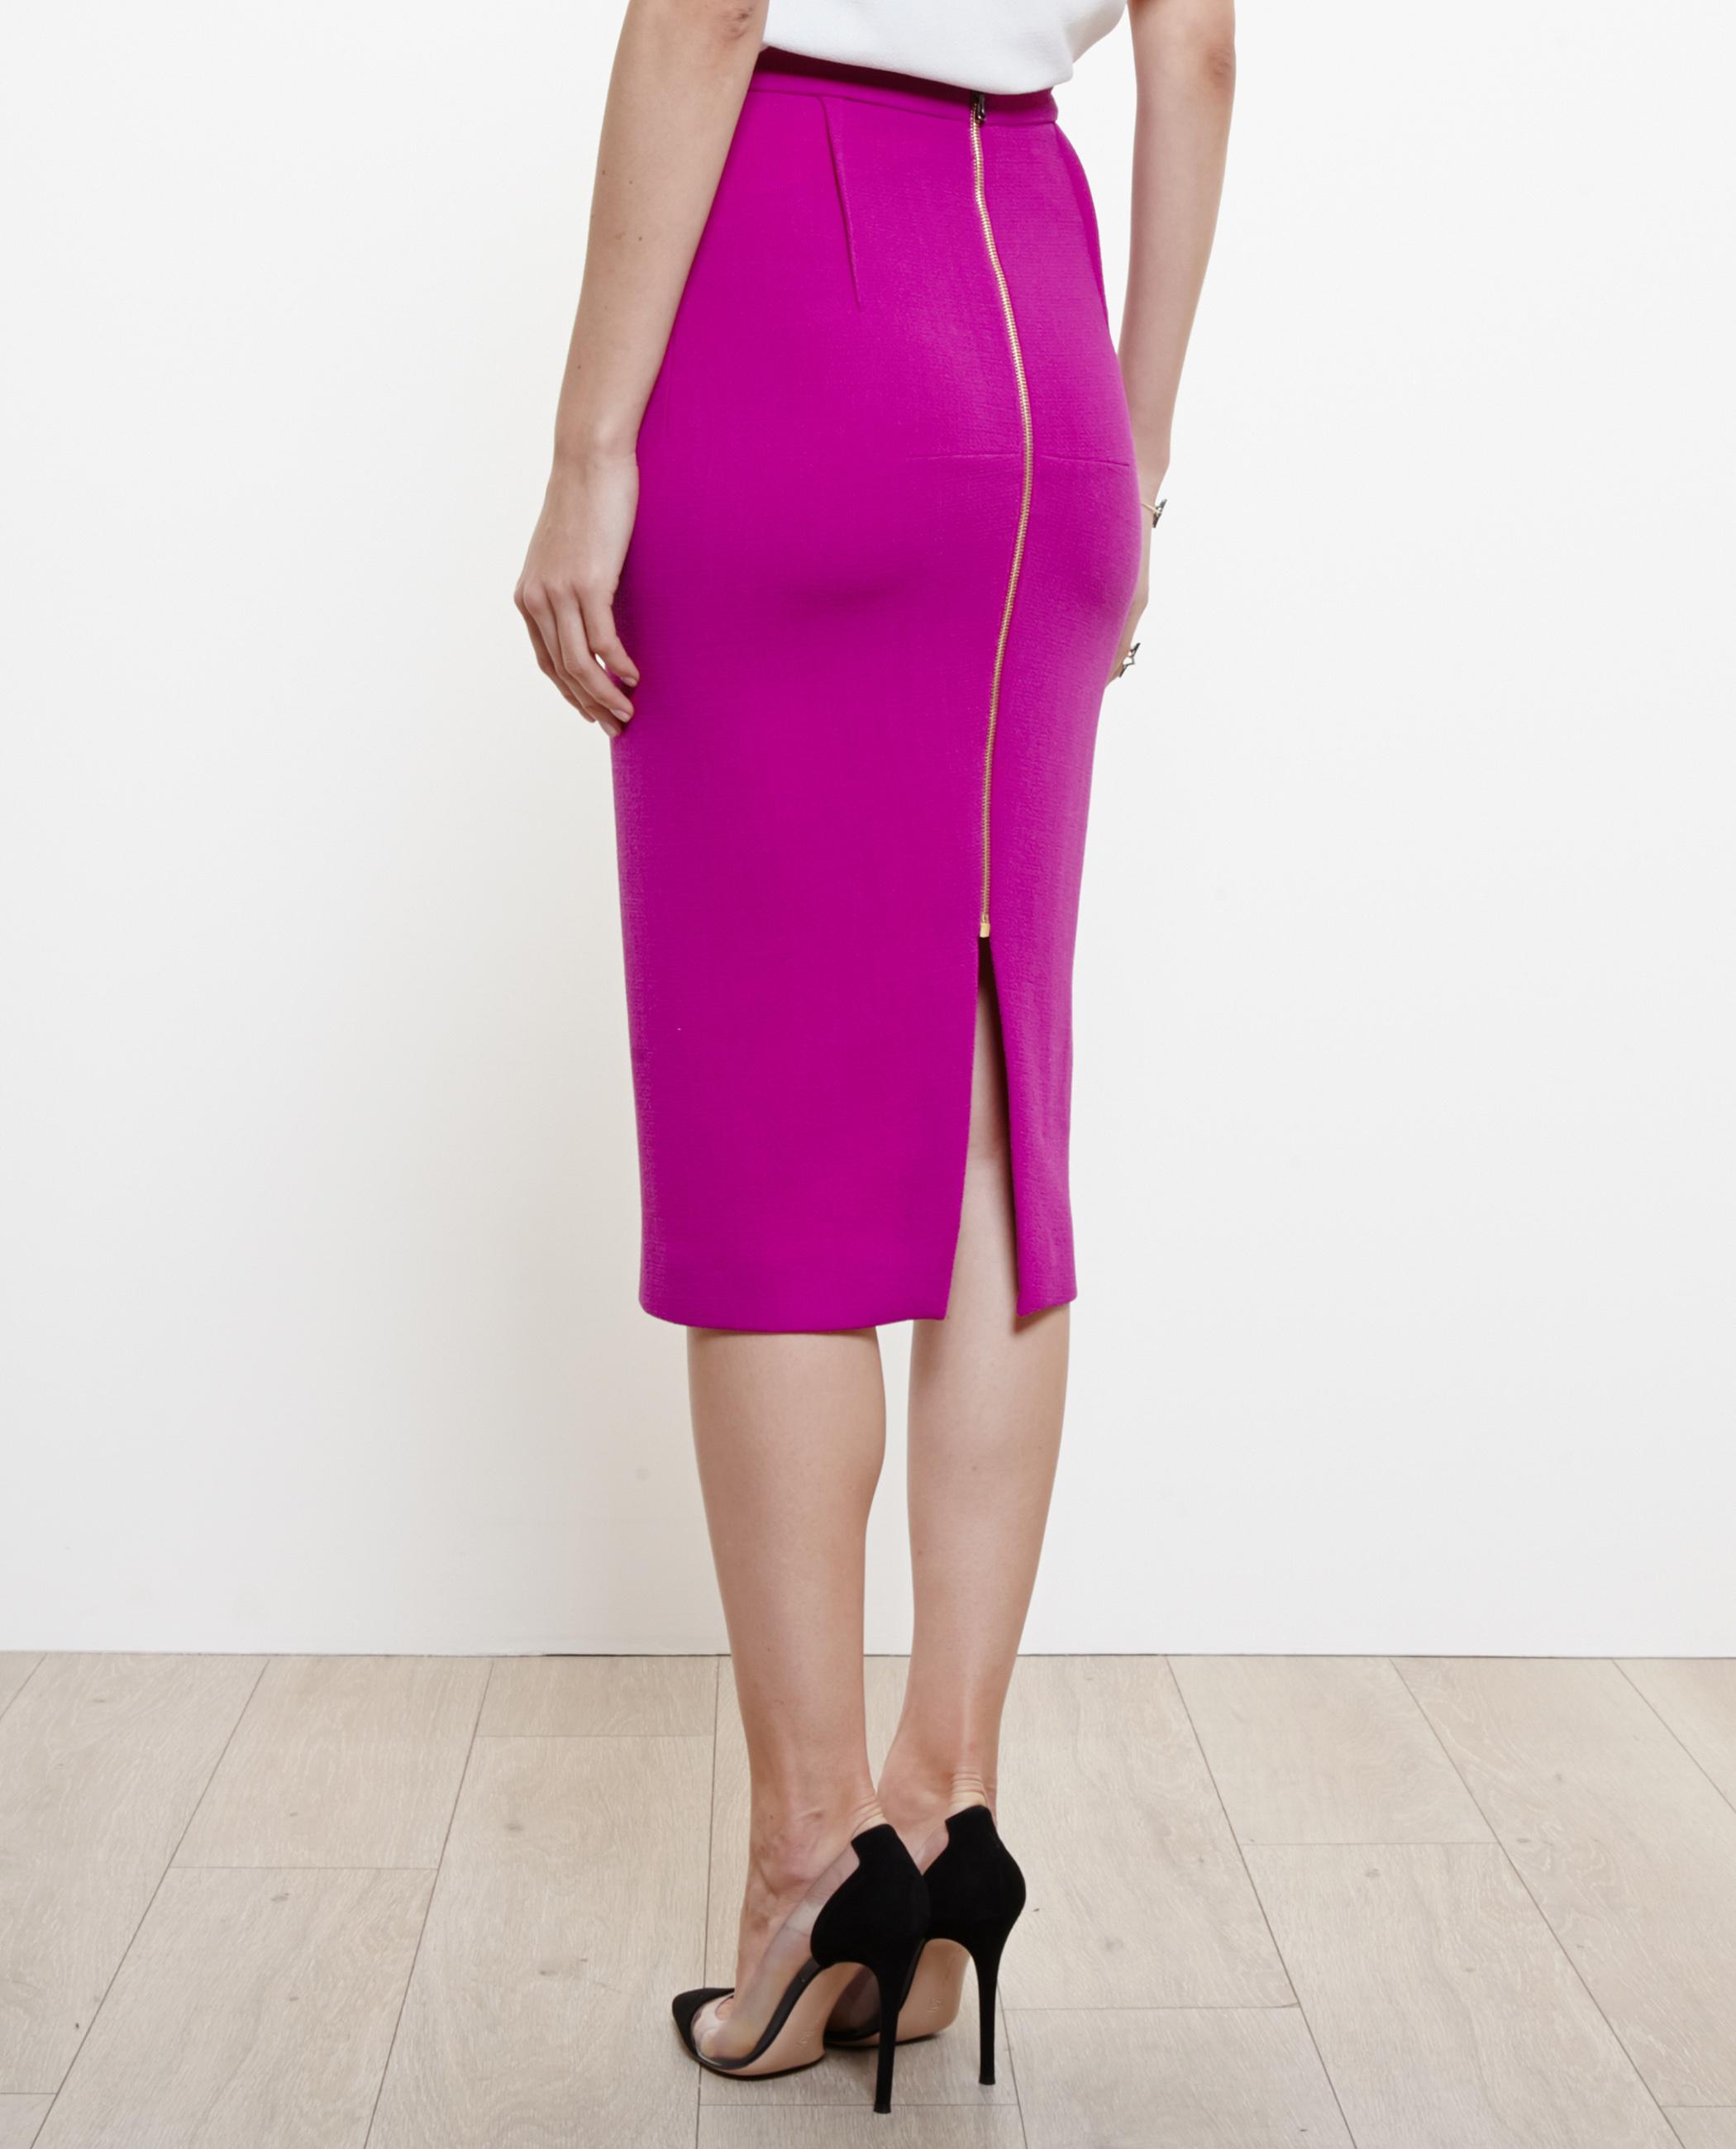 7ad8b7f59 Roland Mouret Arreton Wool Crepe Pencil Skirt in Purple - Lyst